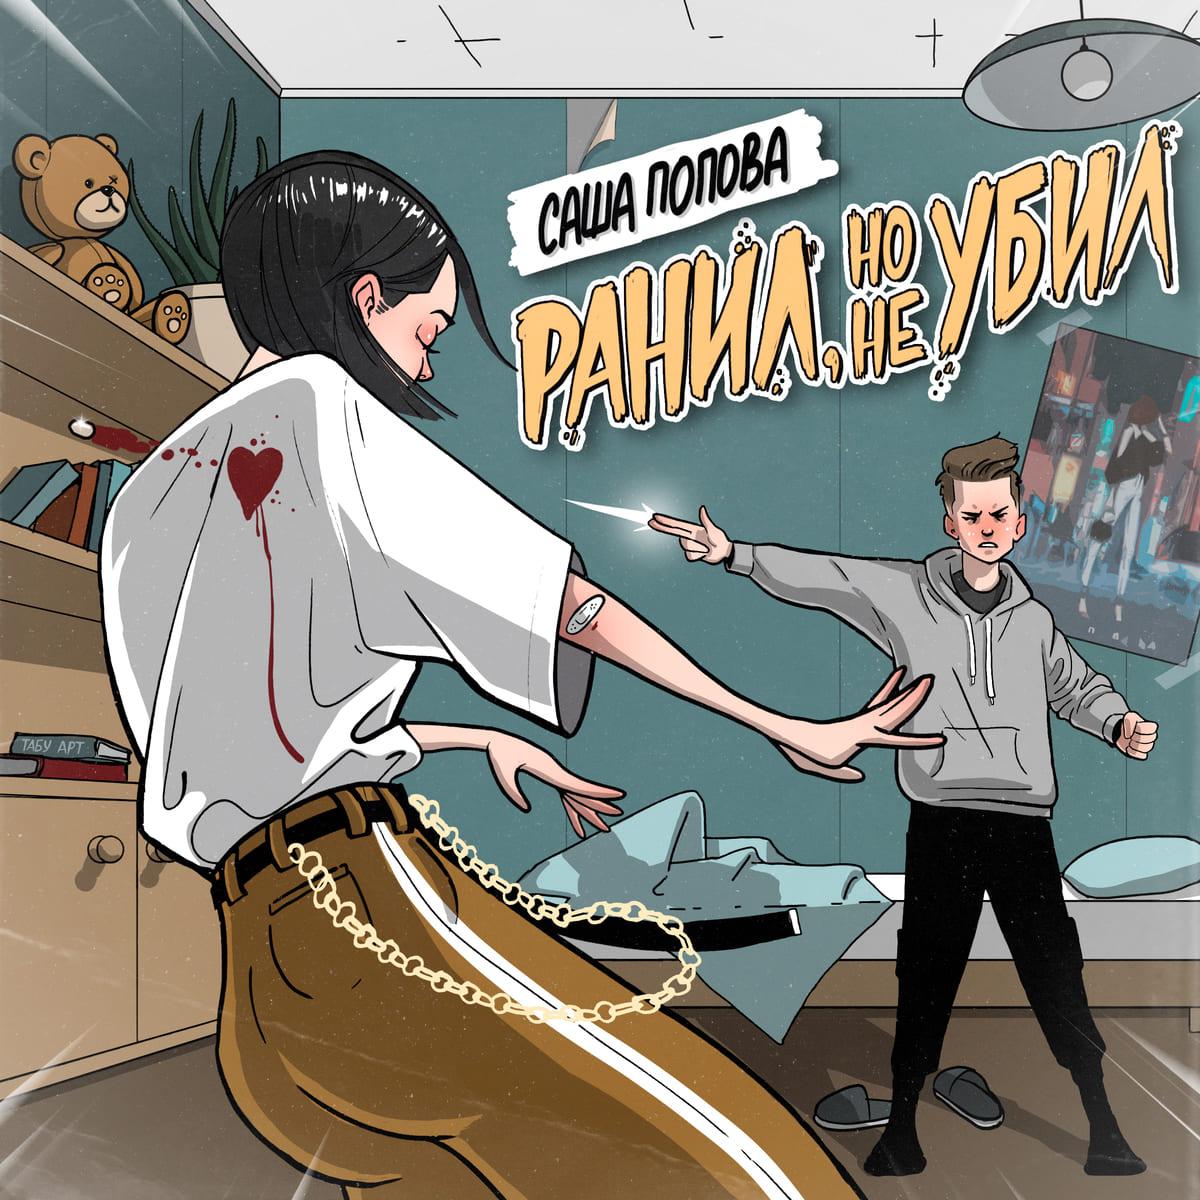 Певица Саша Попова ранил, но не убил финалка (1) (1)